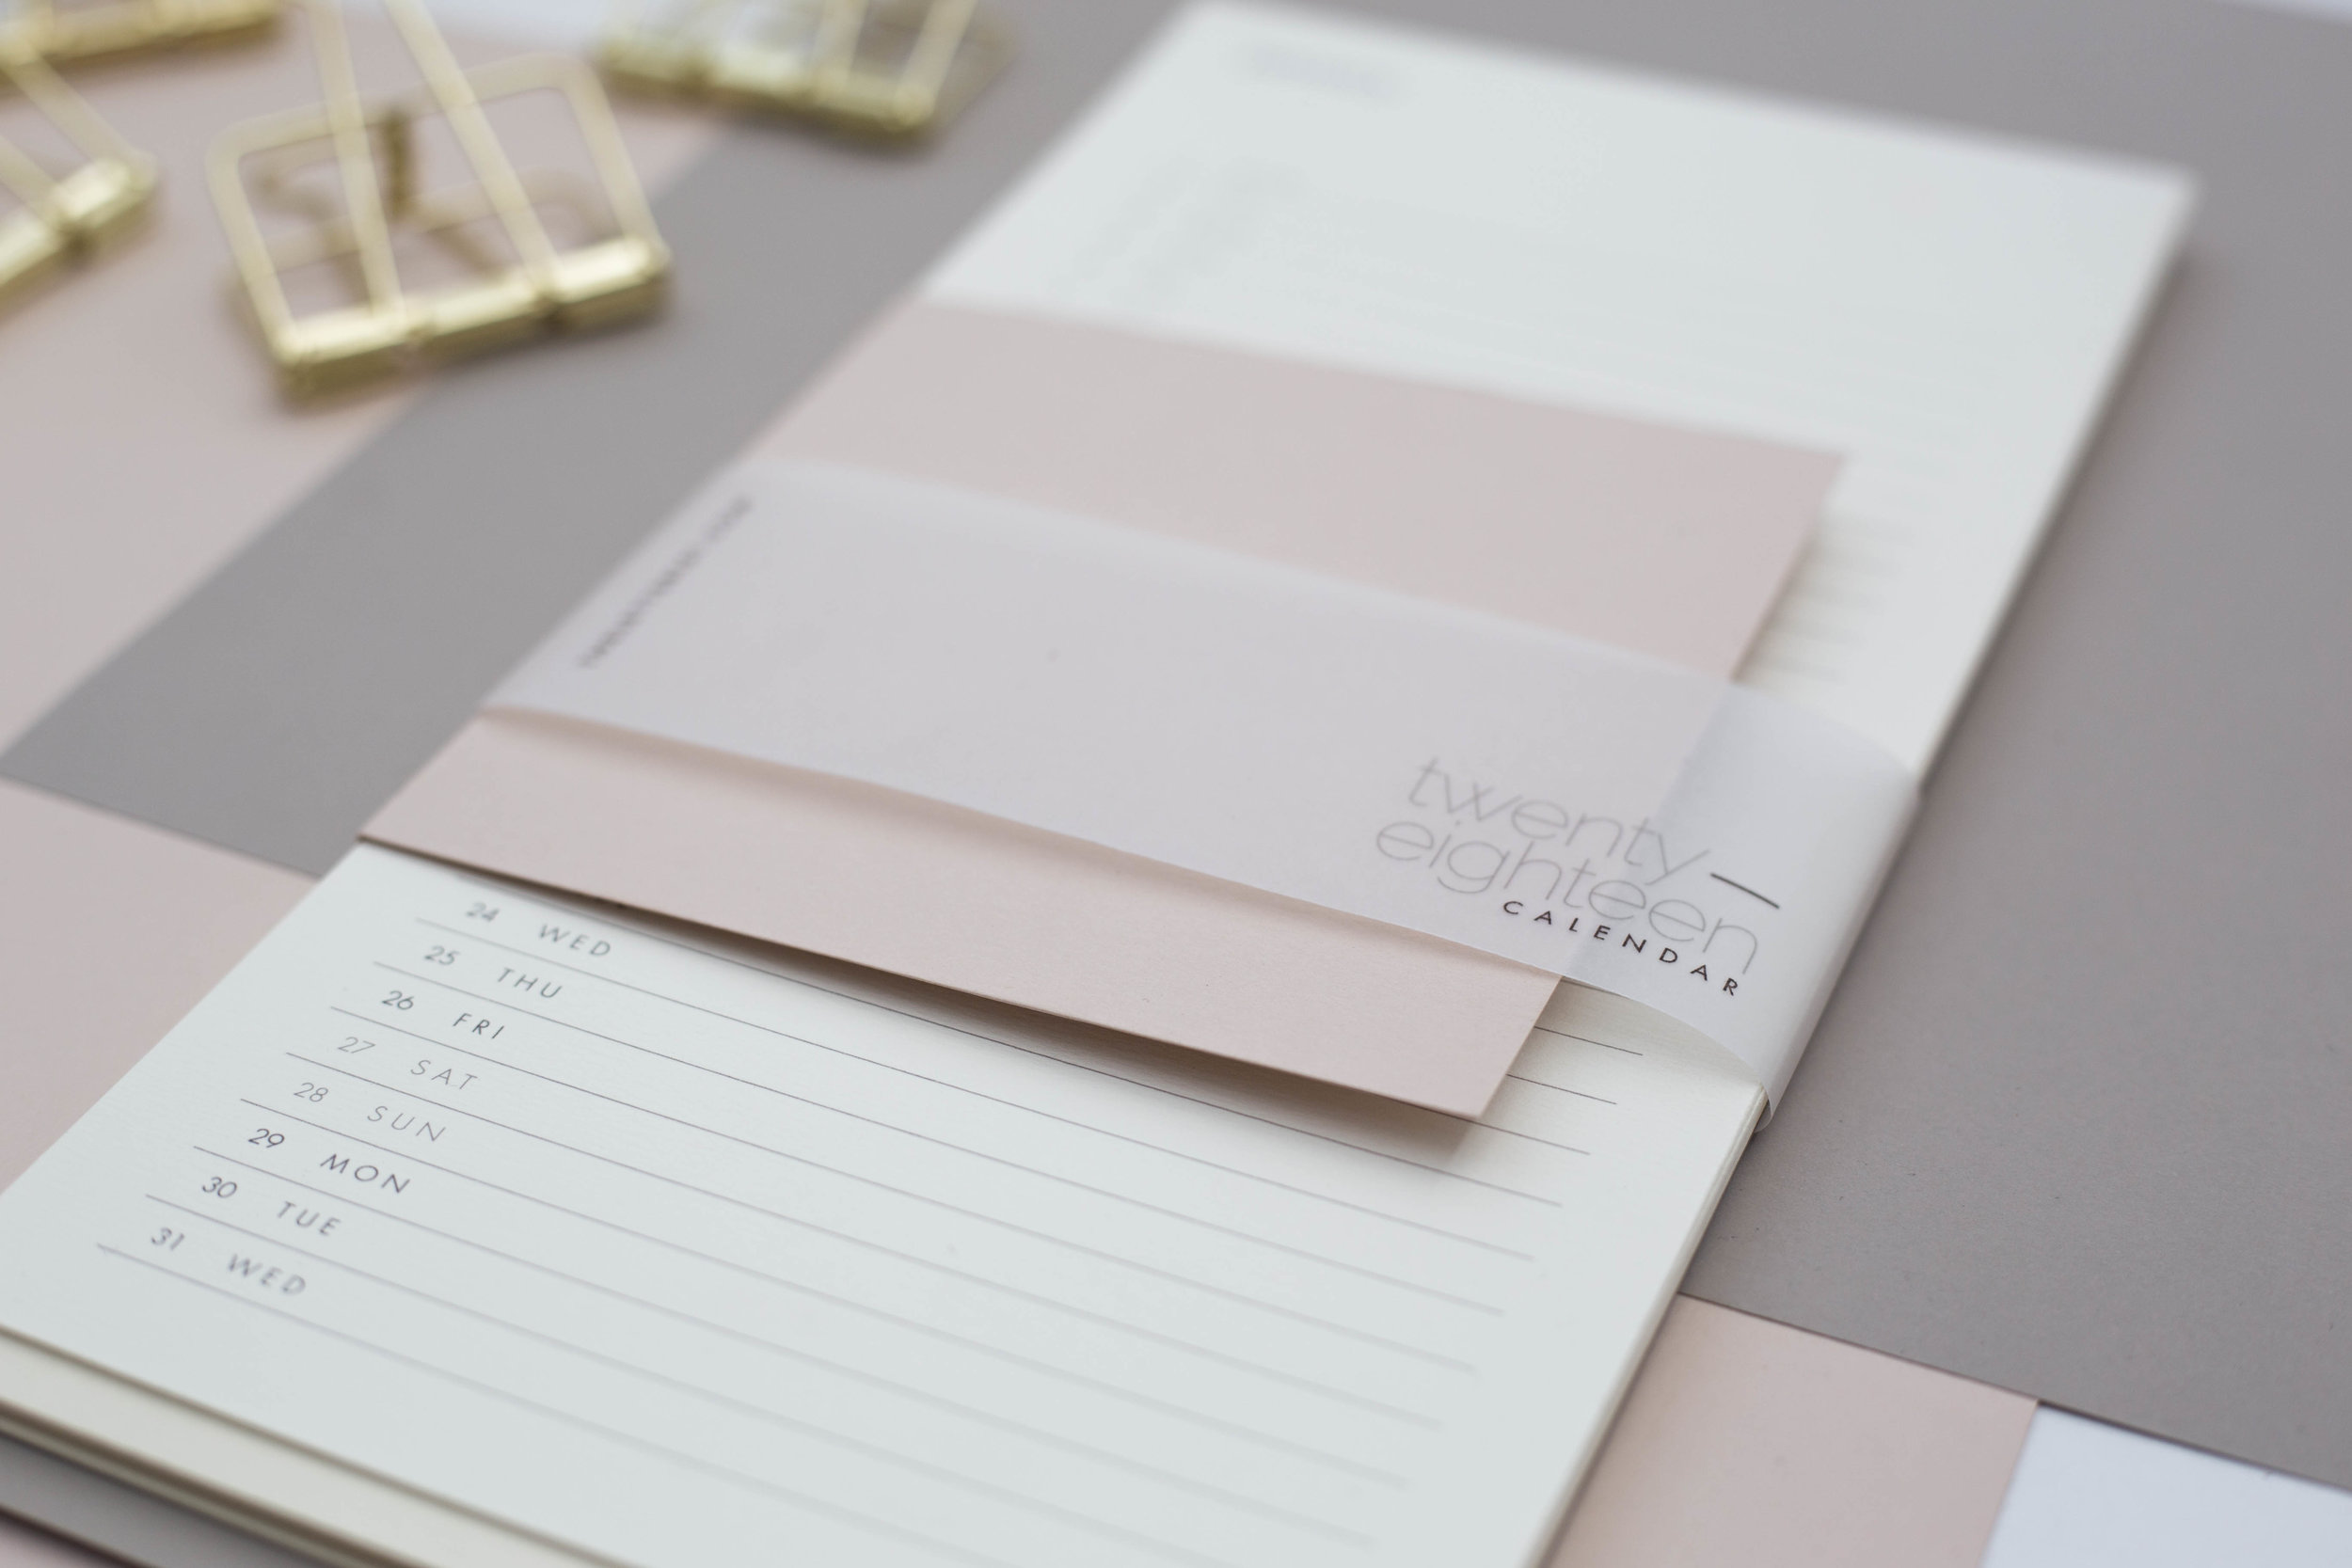 the-letterist-2018-calendar-06.jpg